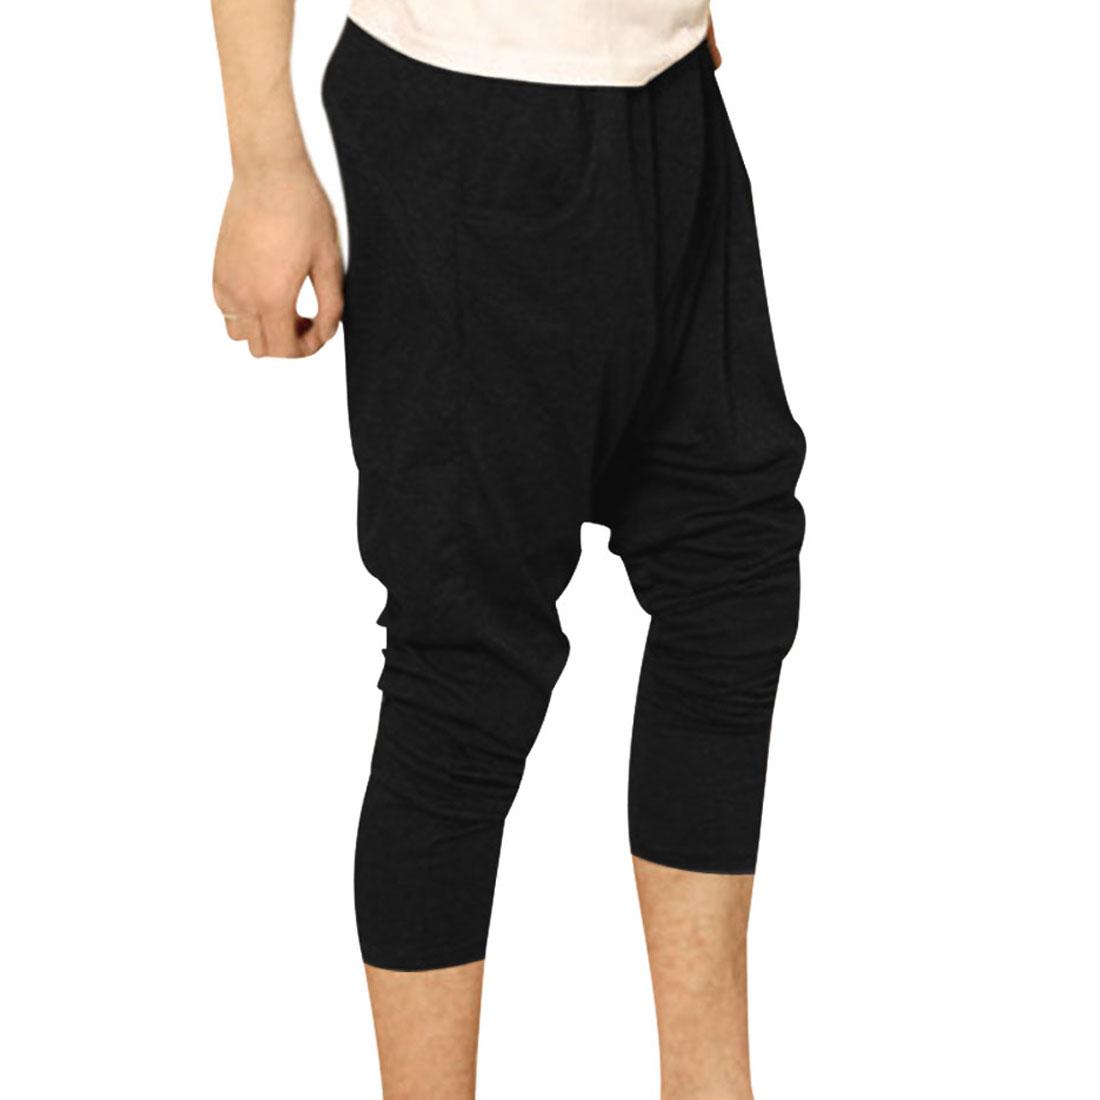 Men Elastic Waist Slant Pockets Letter Prints Harem Pants Black W27